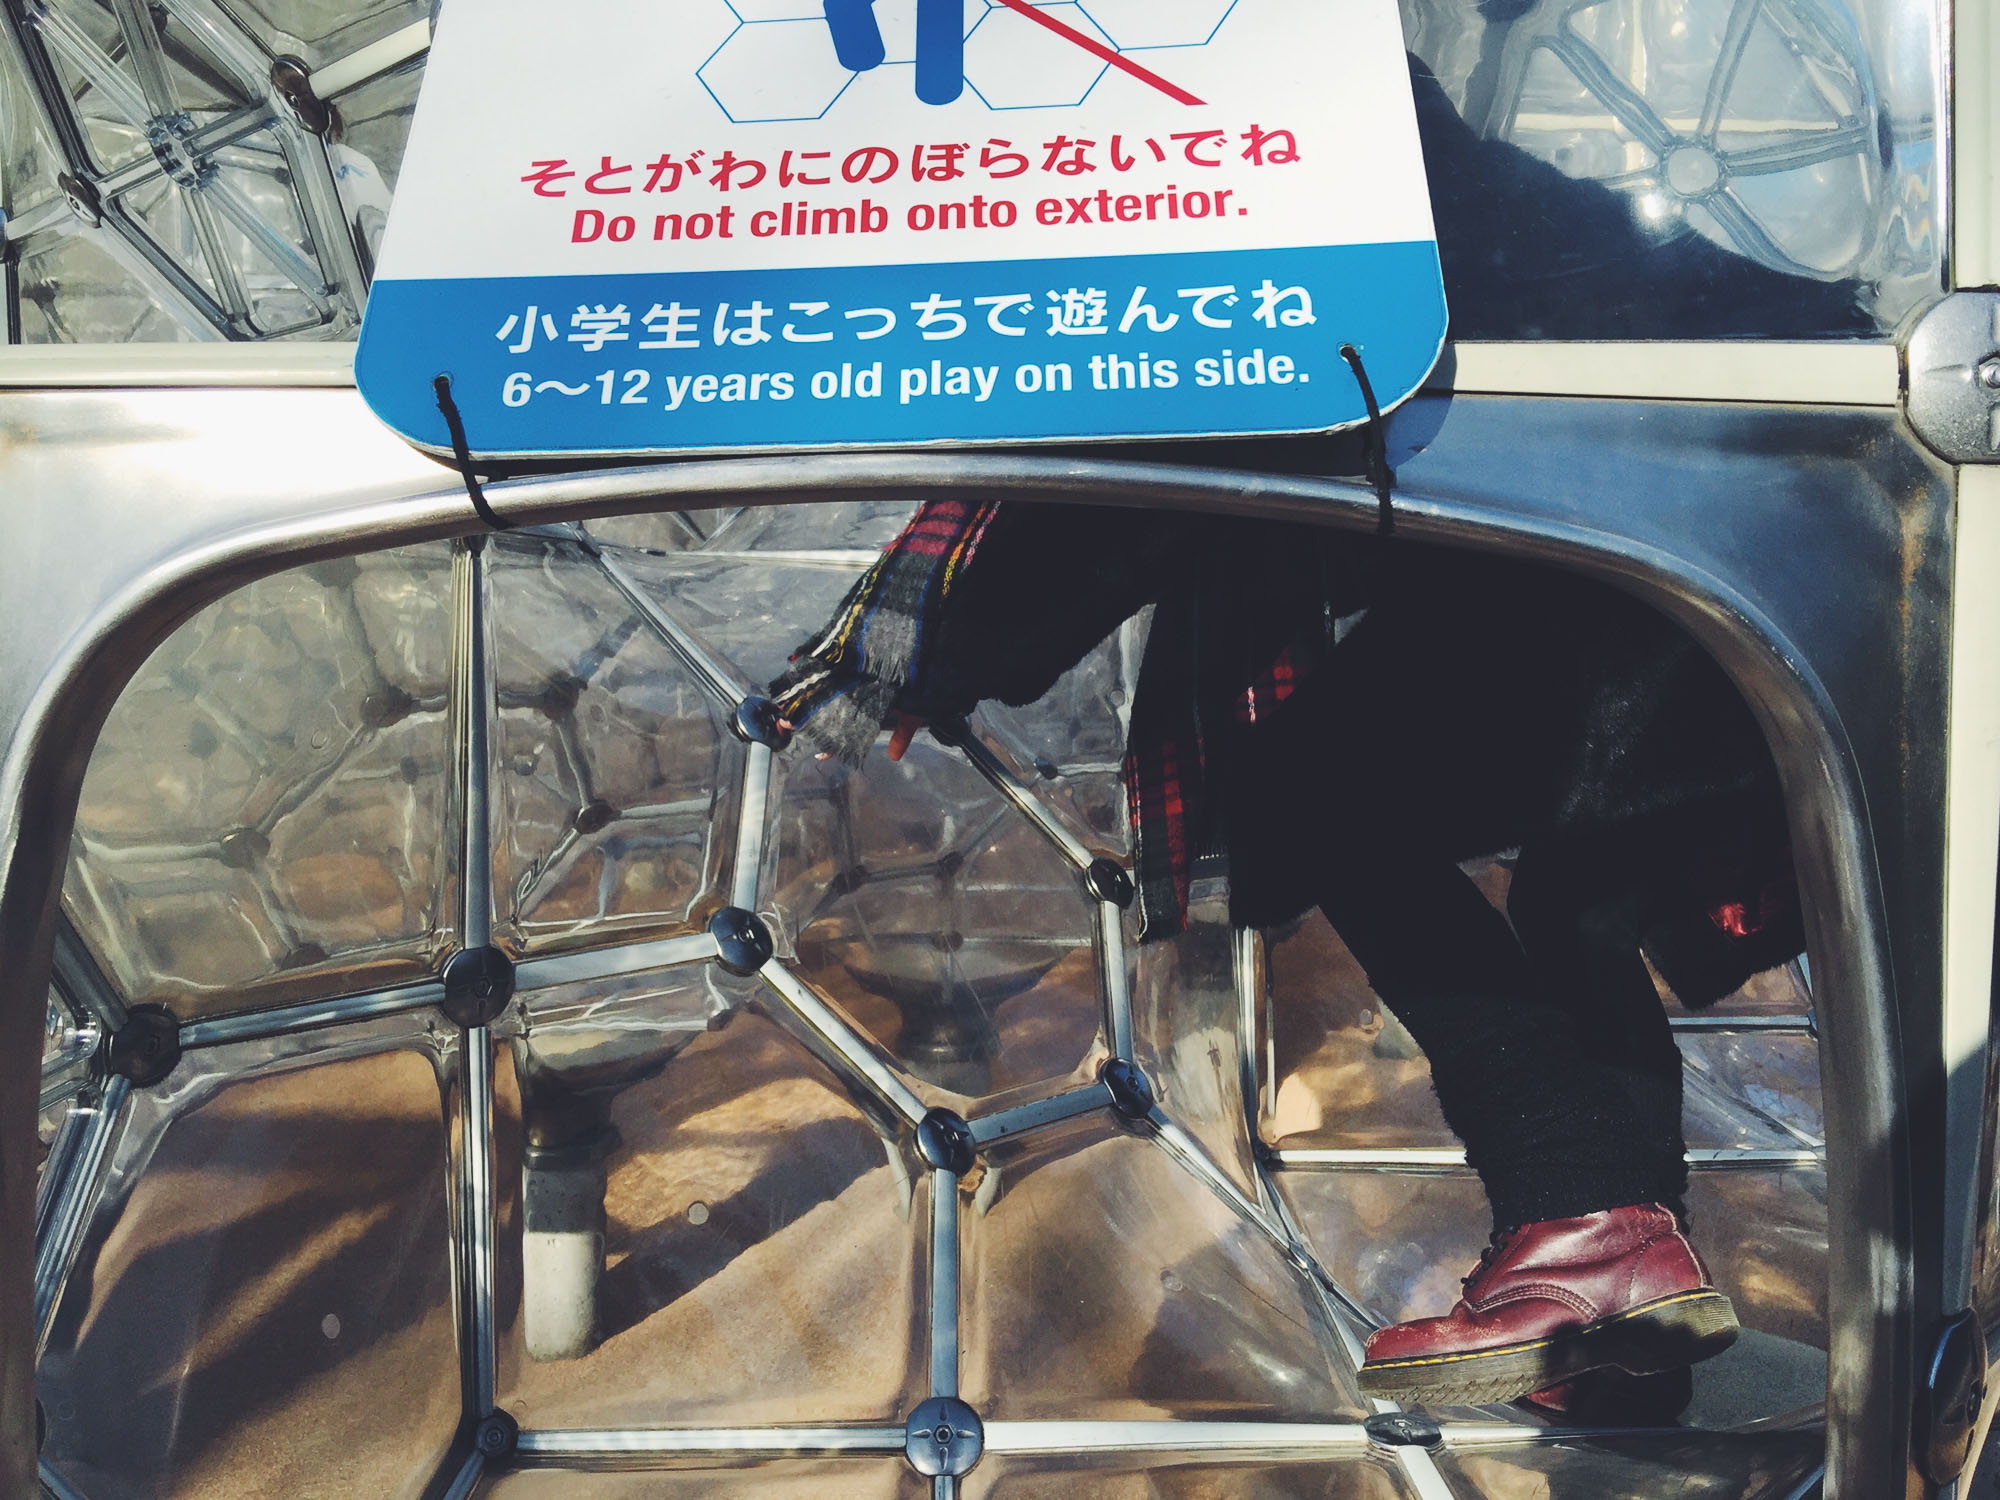 Instagramming Japan - Hakone Opan Air Museum